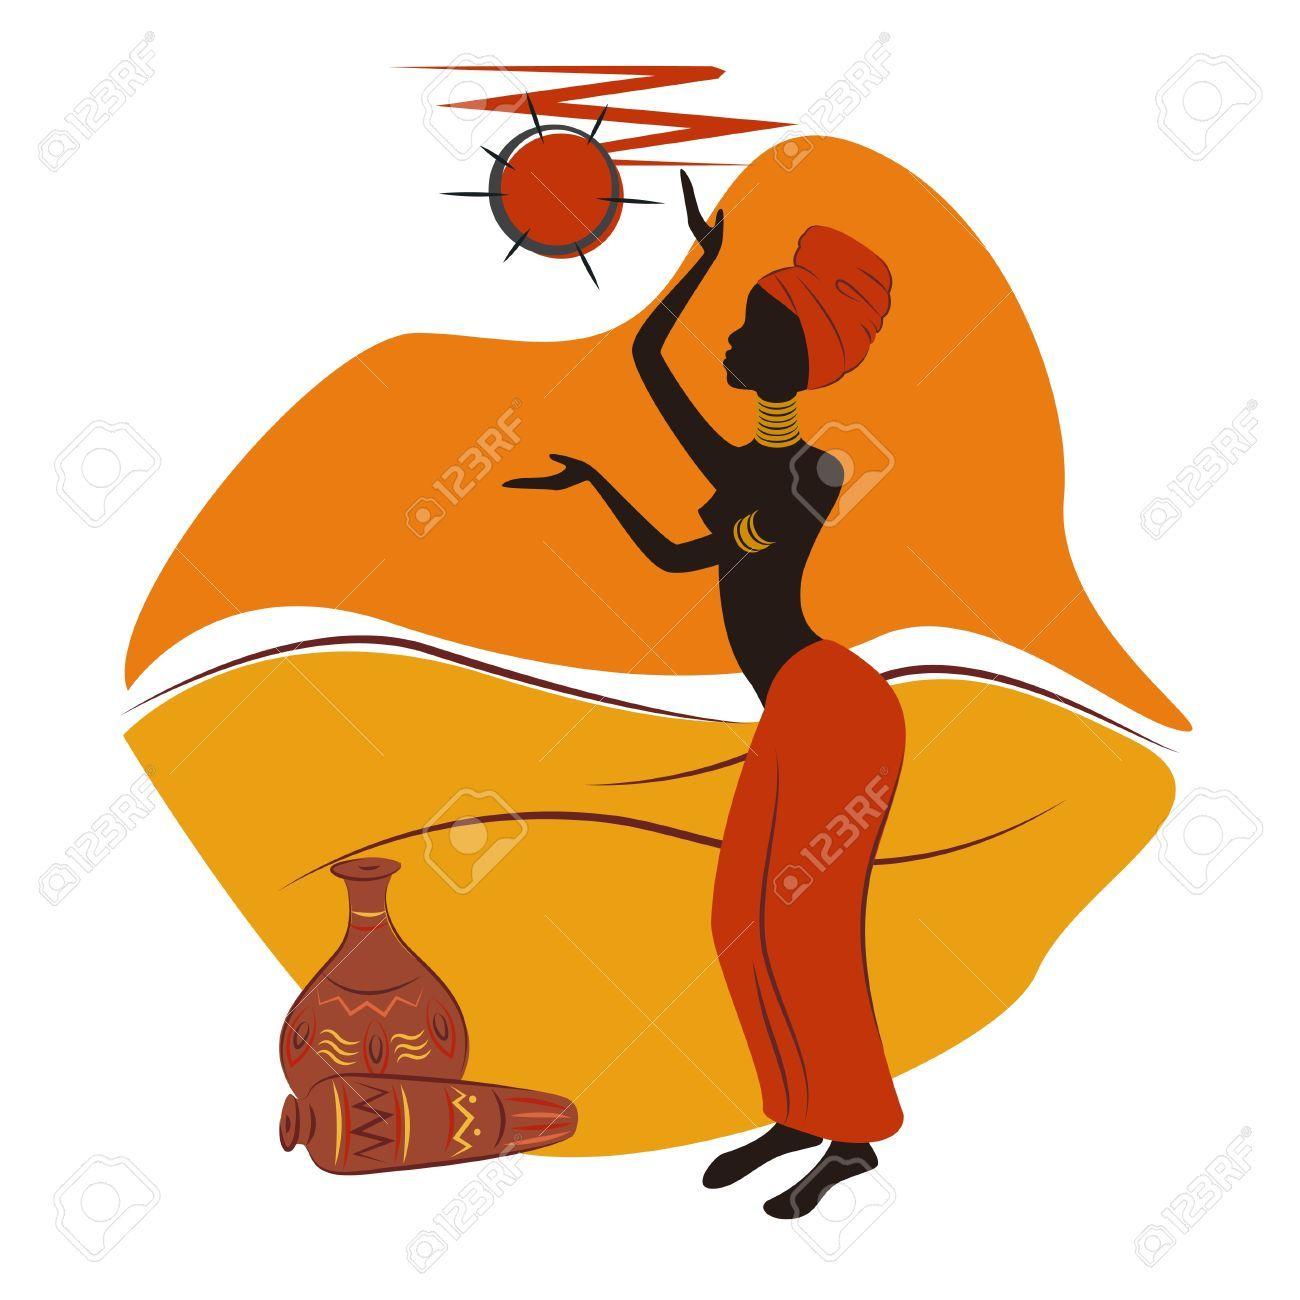 Dibujos africanos etnicos buscar con google dibujos - Africaine dessin ...